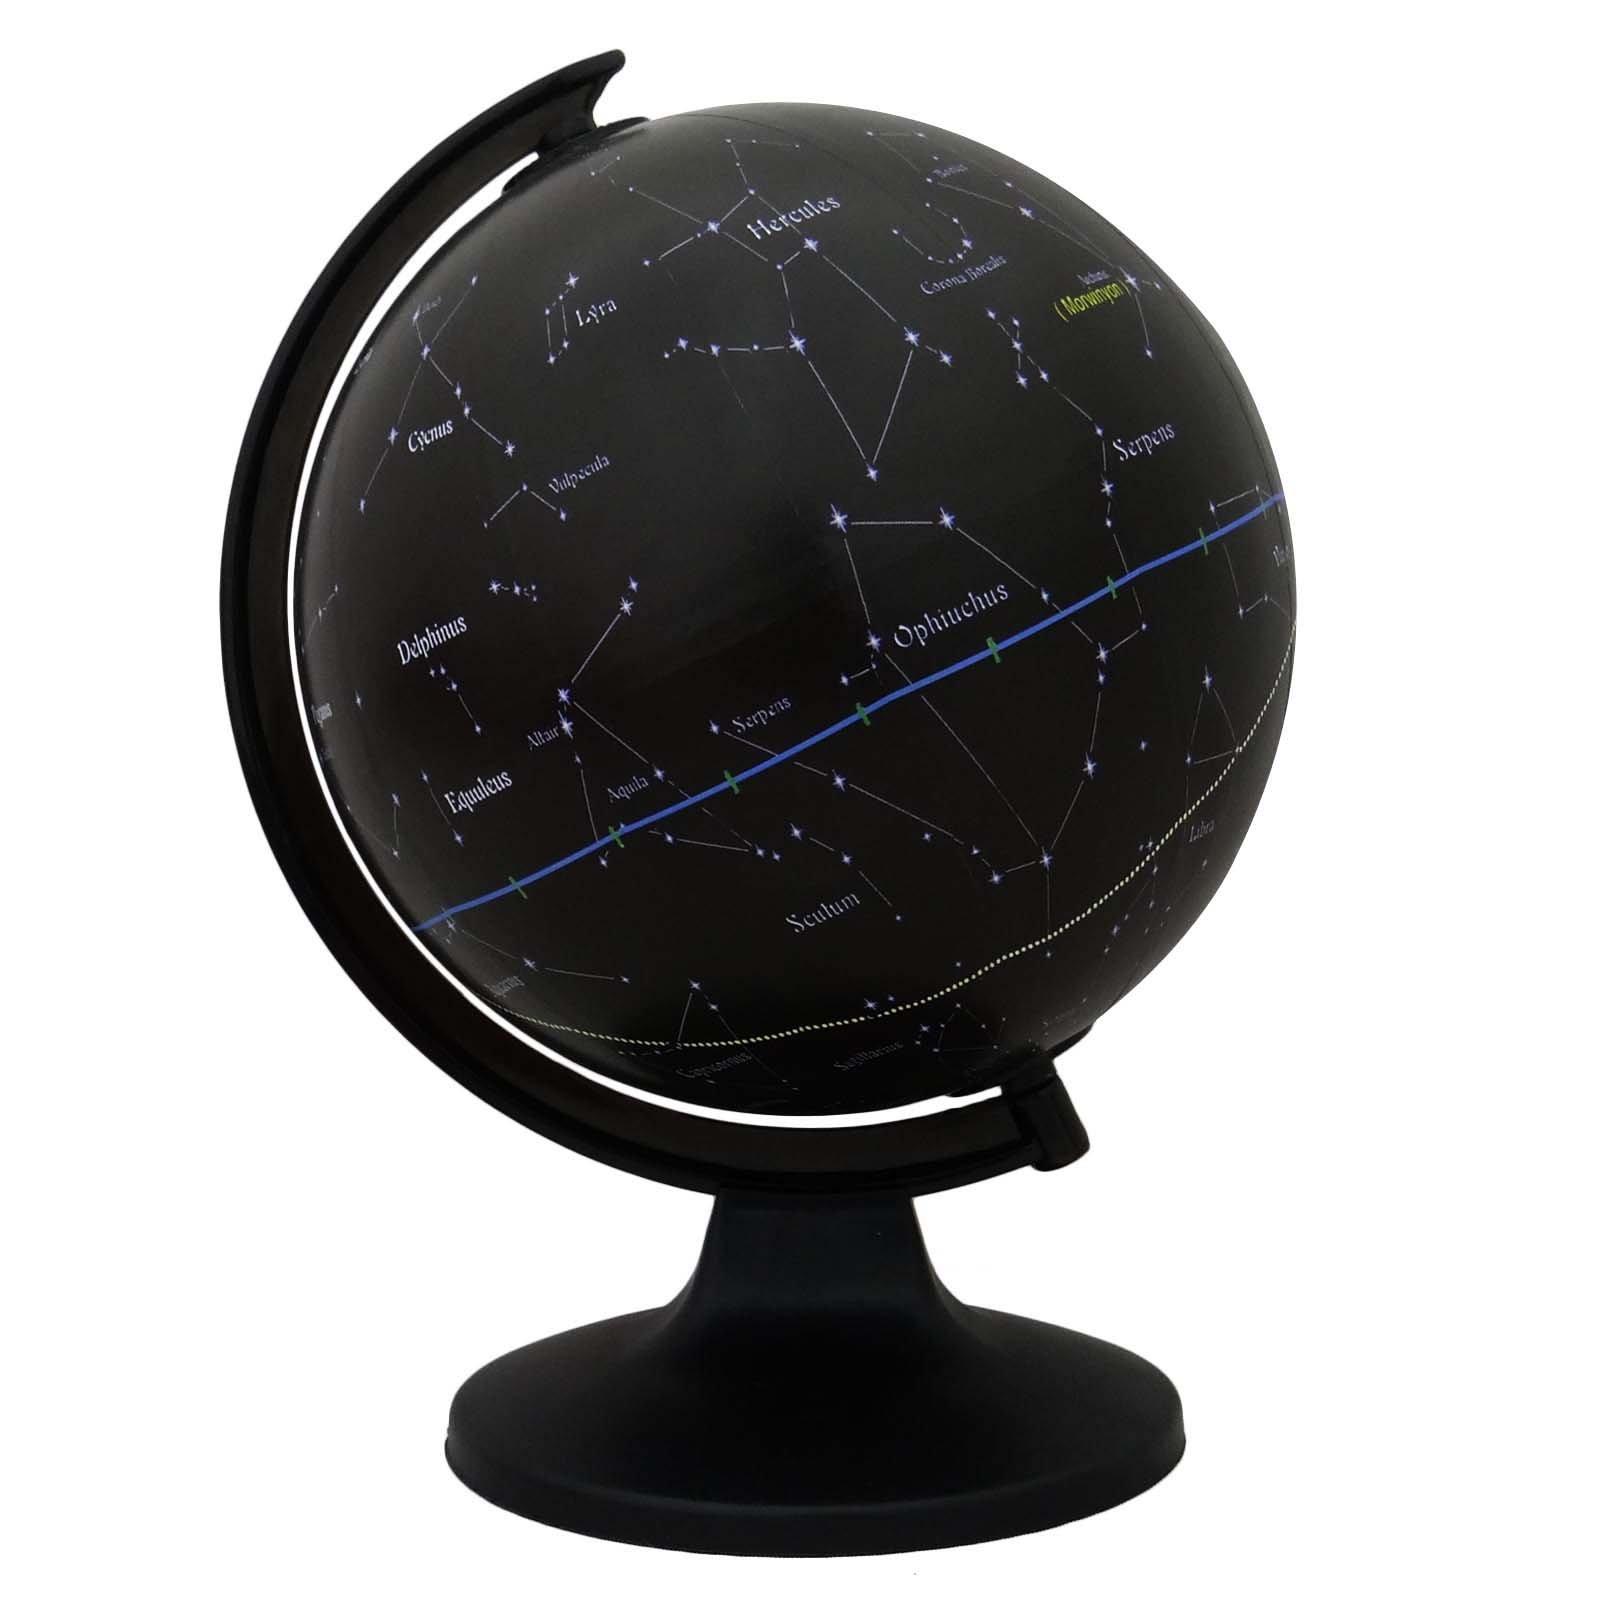 Uniworld Décorative Desktop Rotating Globe Constellation Stars Globes Table Décor 11.3''